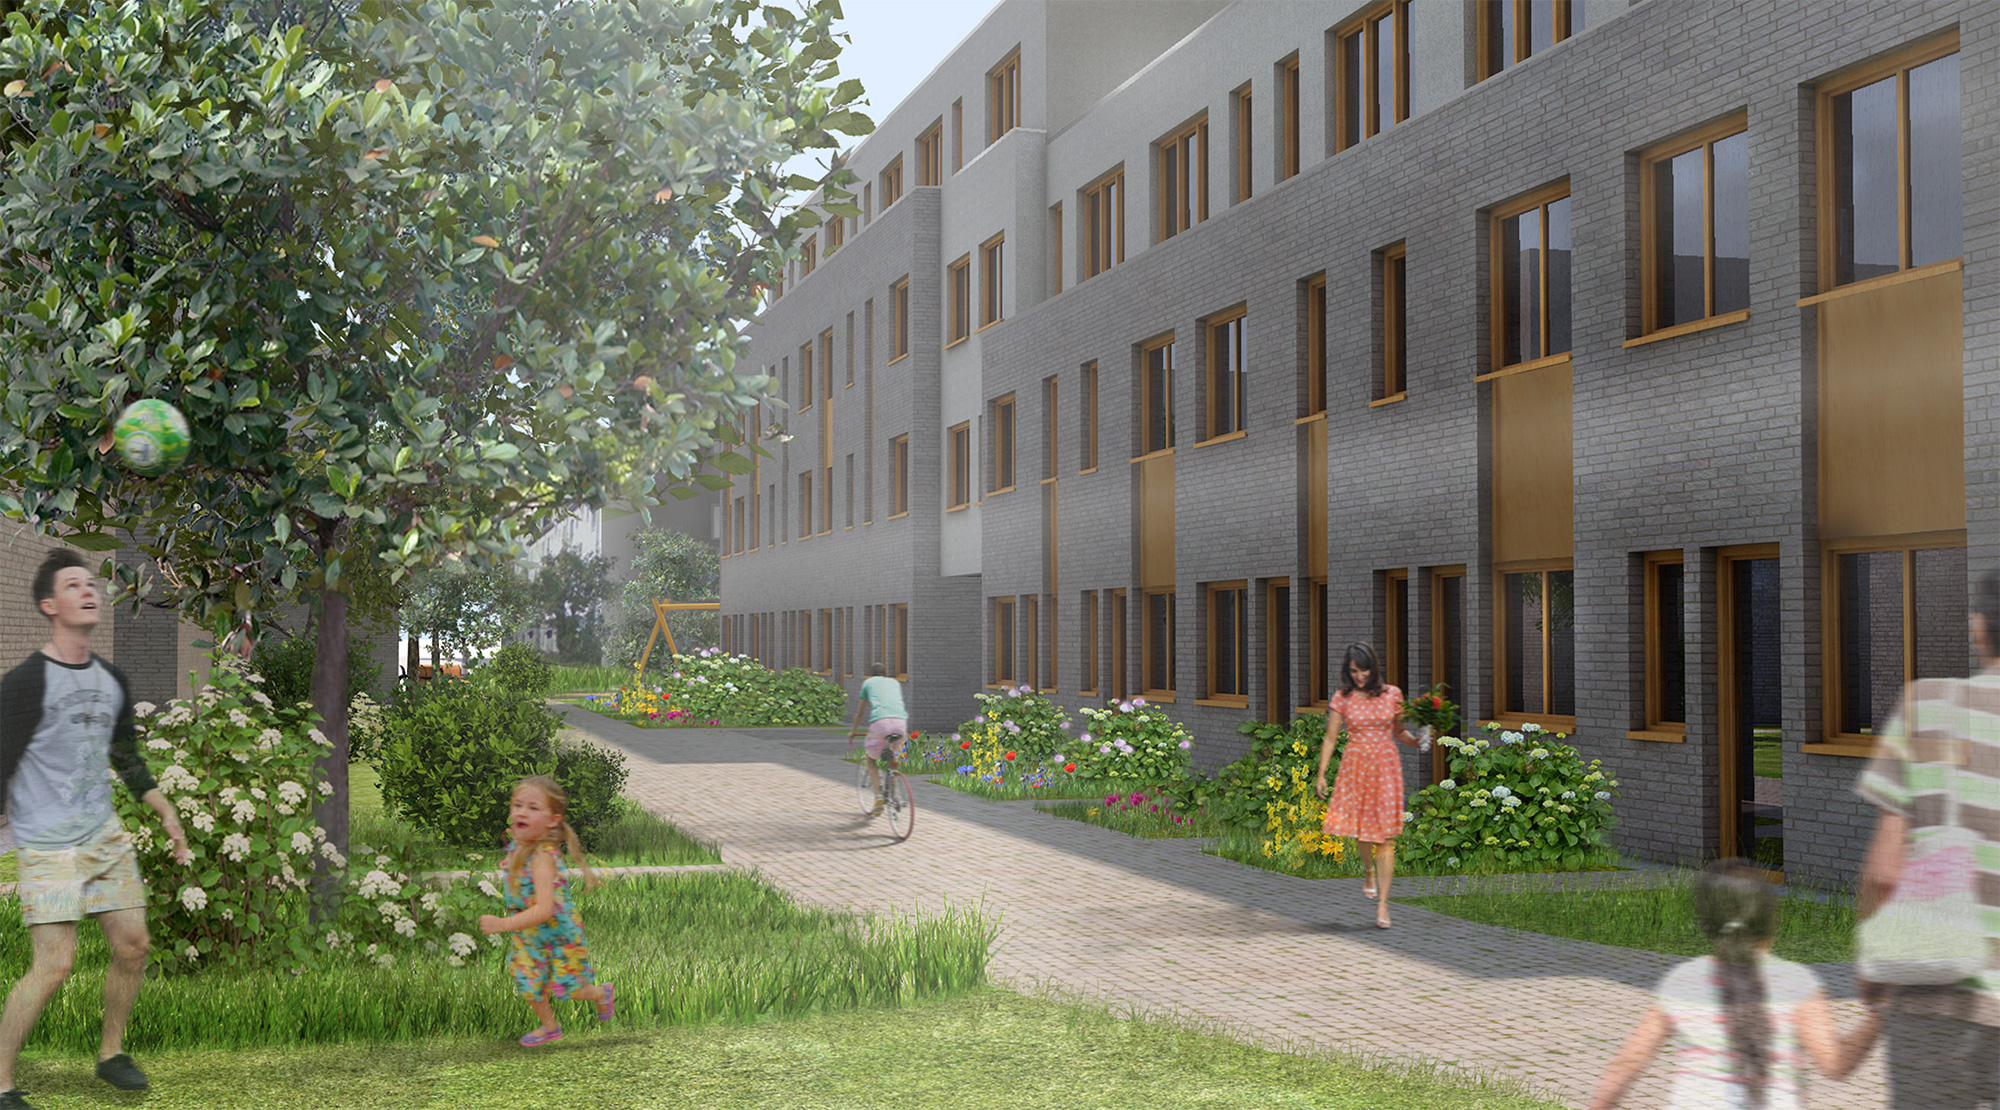 heckundschmiegel-projekte-suitbertusstrasse-2